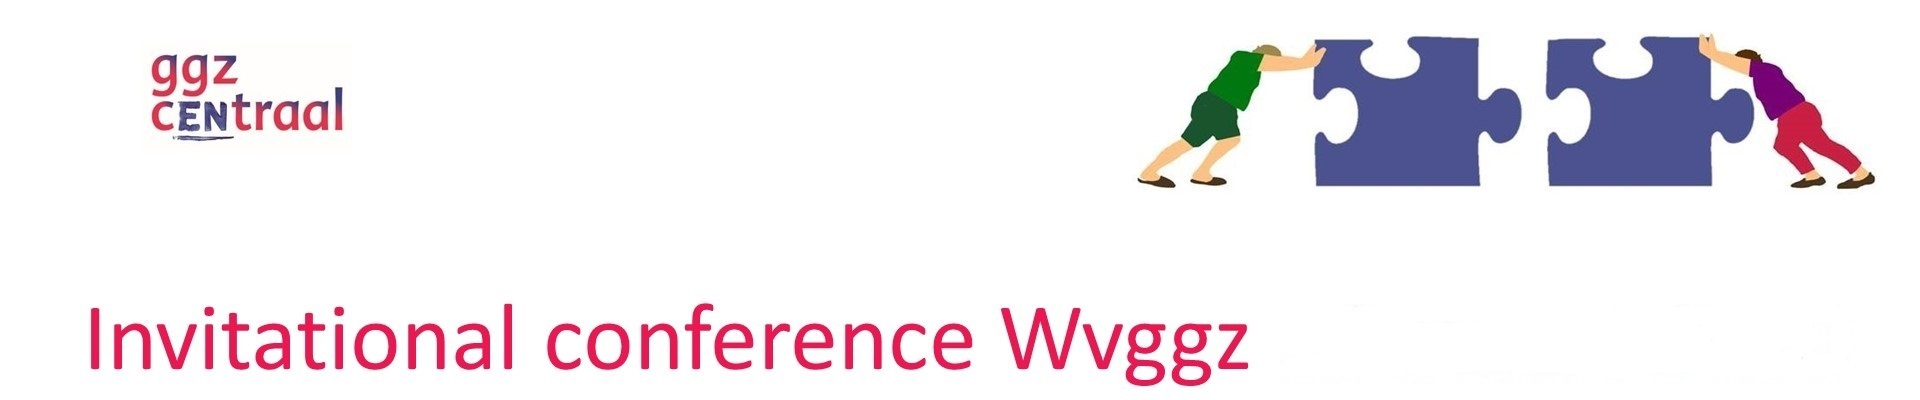 Invitational conference Wvggz 15oktober